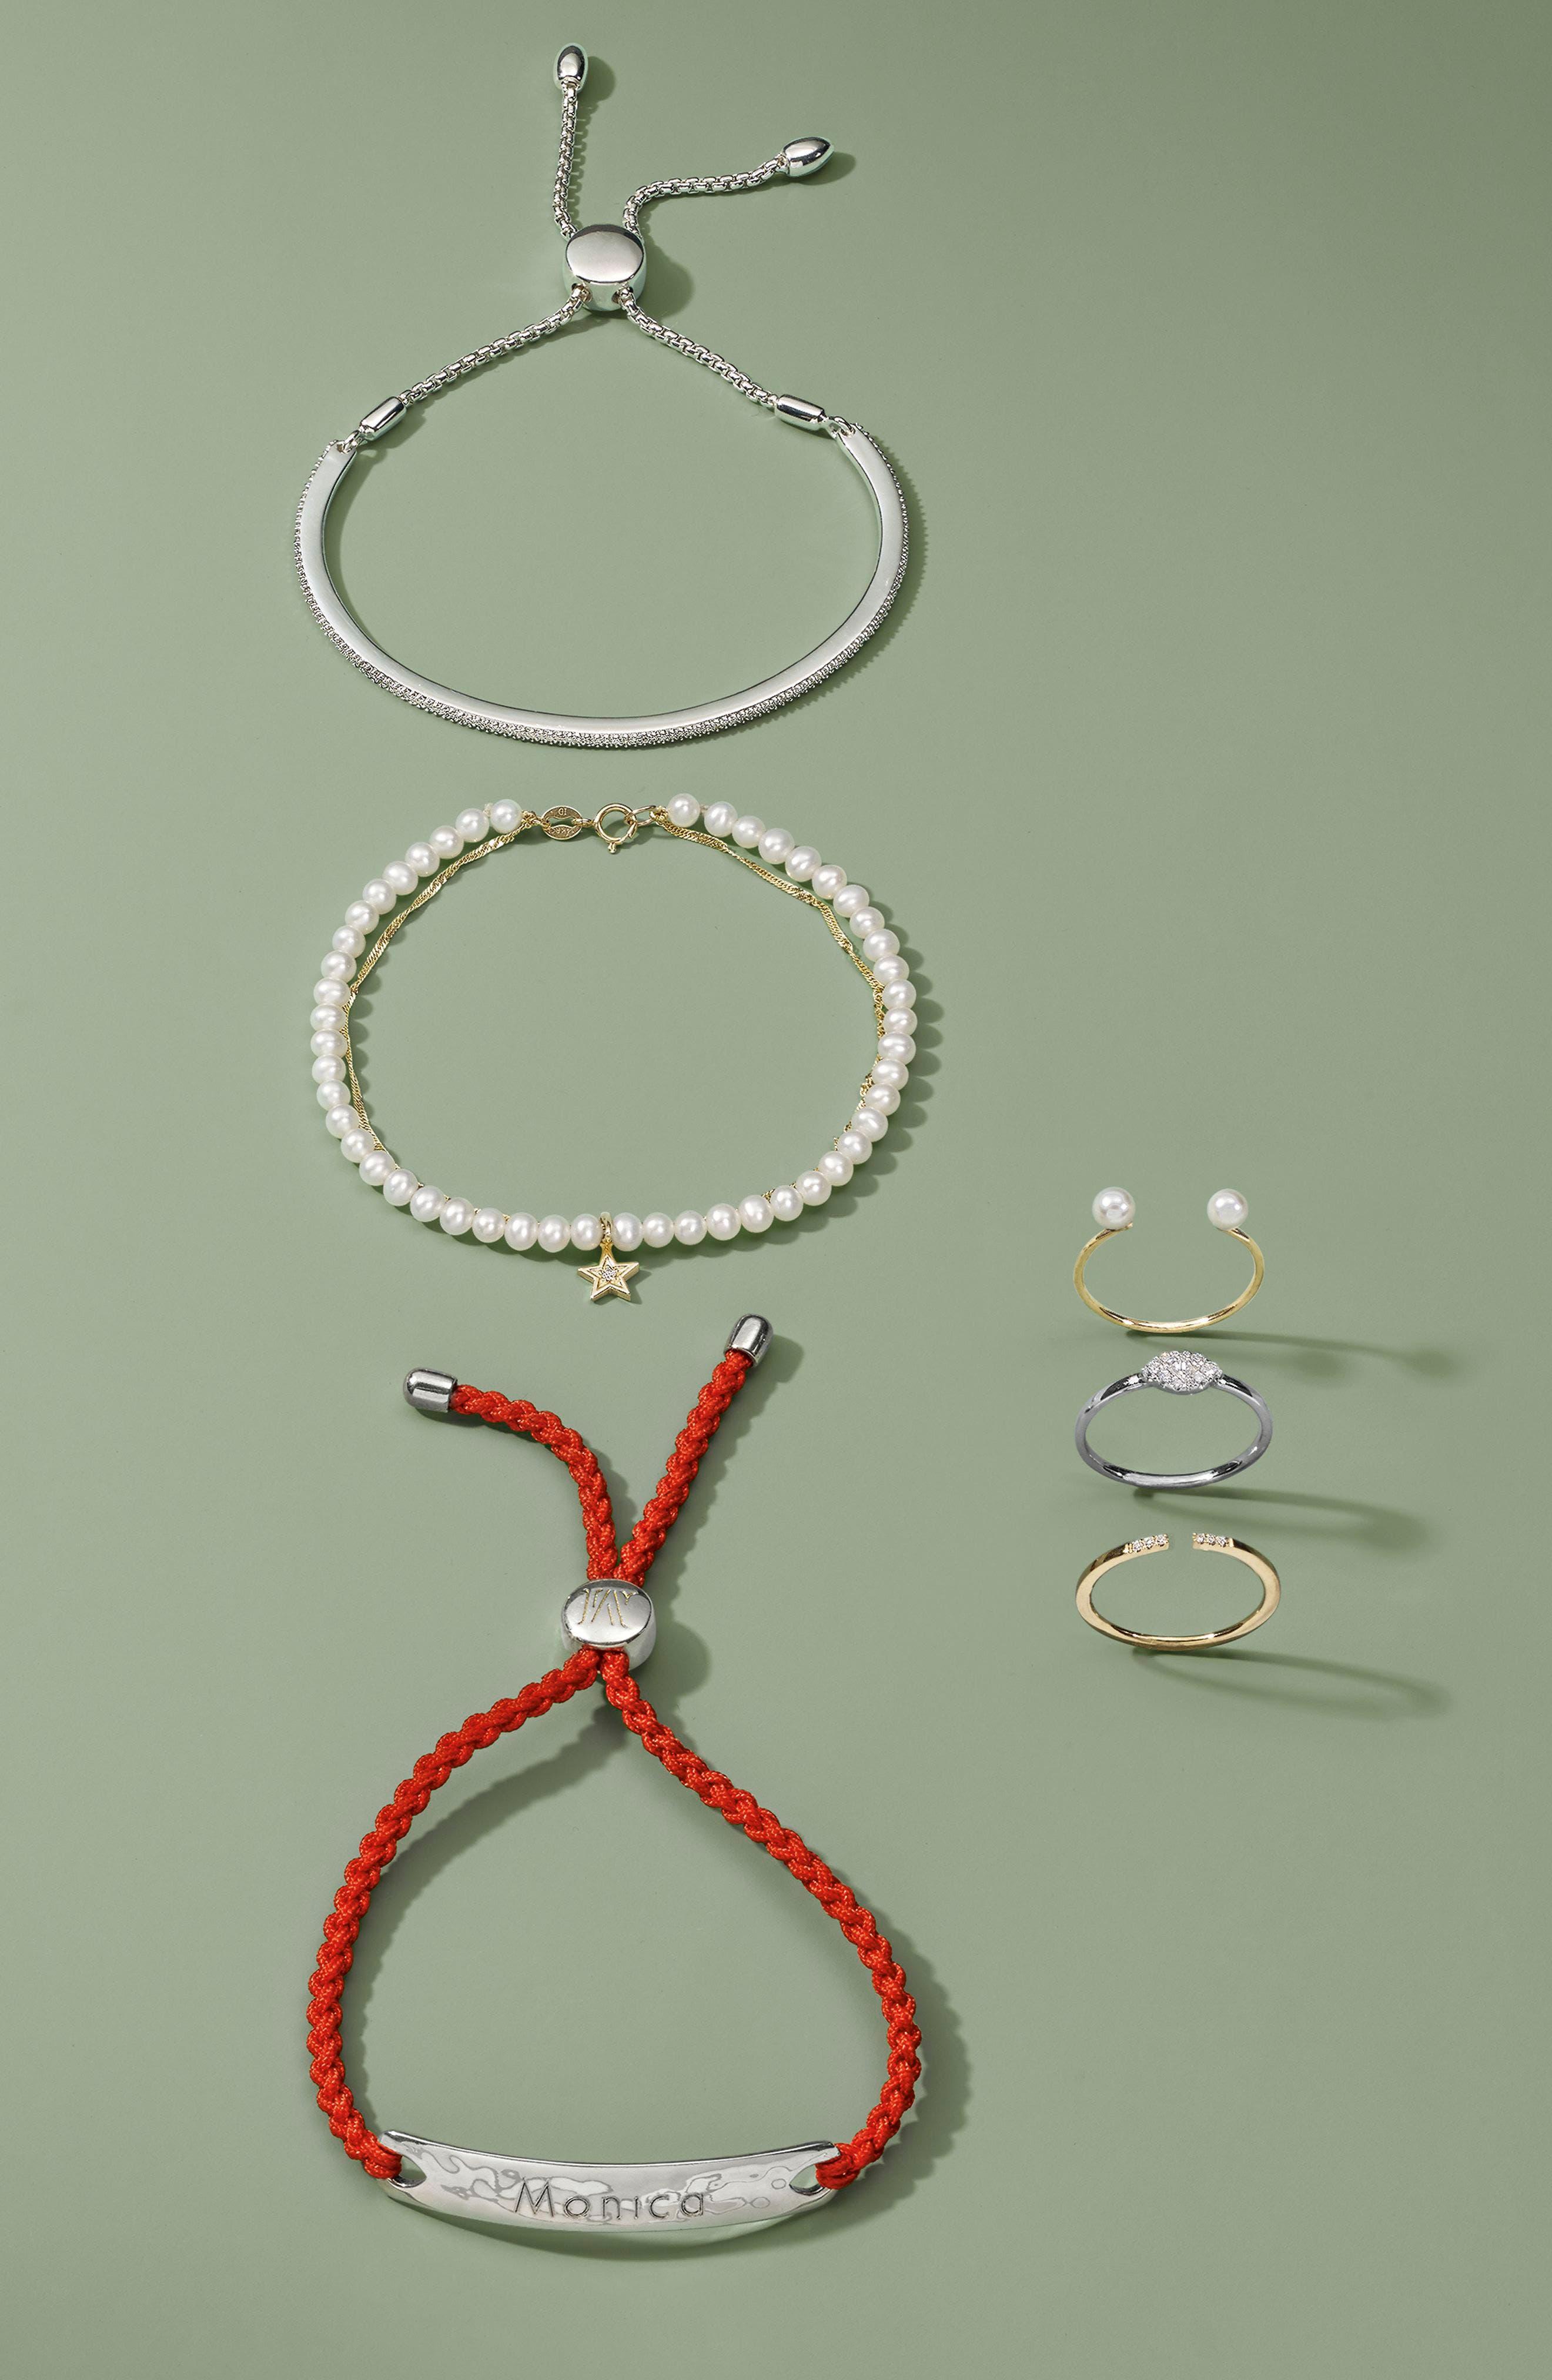 Pavé Diamond & Pearl Chain Bracelet,                             Alternate thumbnail 2, color,                             Yellow Gold